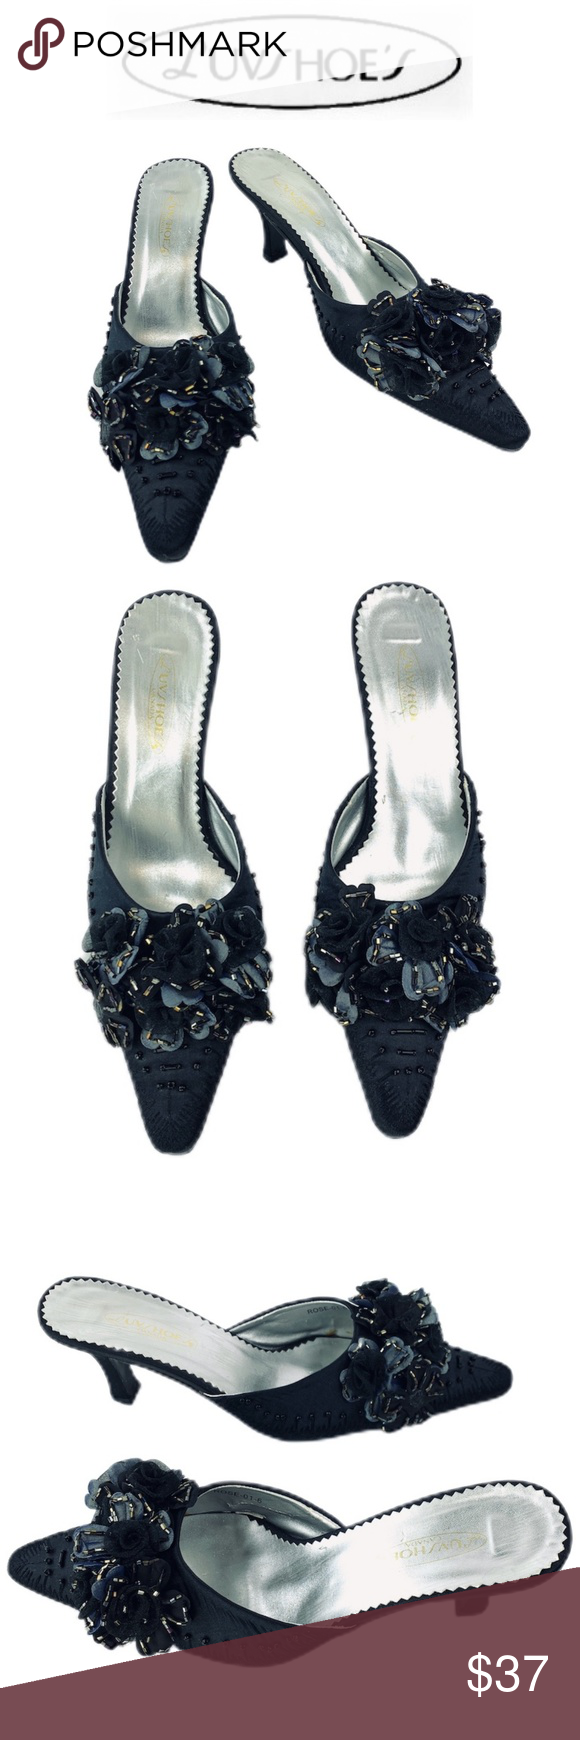 Luvshoe S Rose Black Blue Beaded Floral Heel Luvshoe S Canada Rose Black Blue Beaded Floral Heel Slide Kitten Floral Heels Shoes Women Heels Kitten Heel Pumps